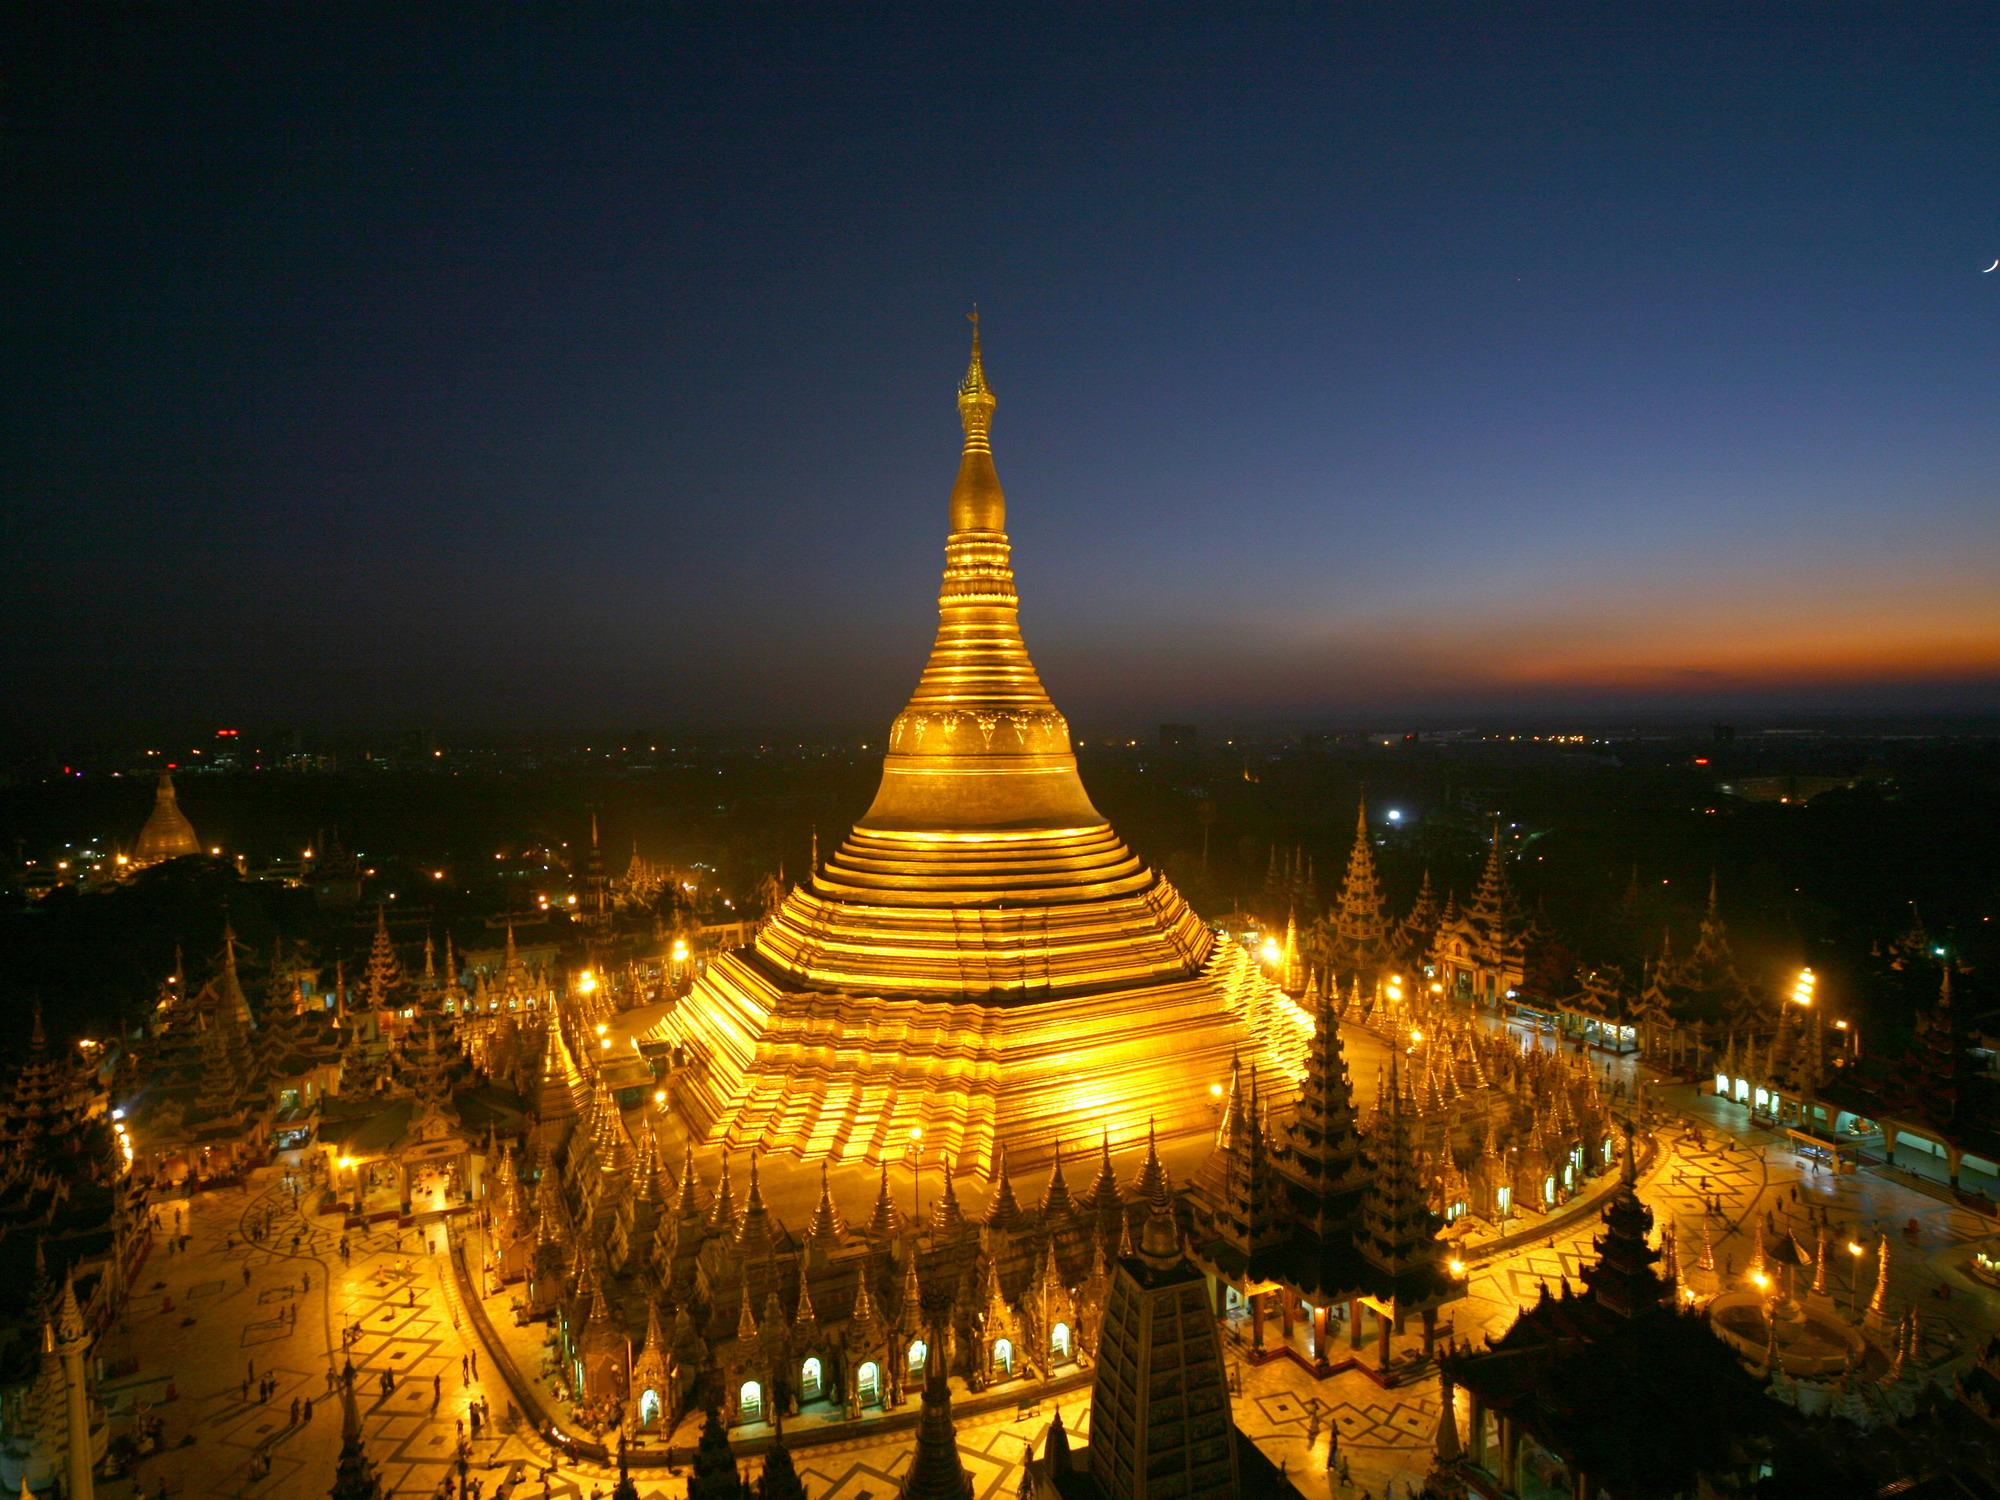 5. Pagoda de Shwedagon